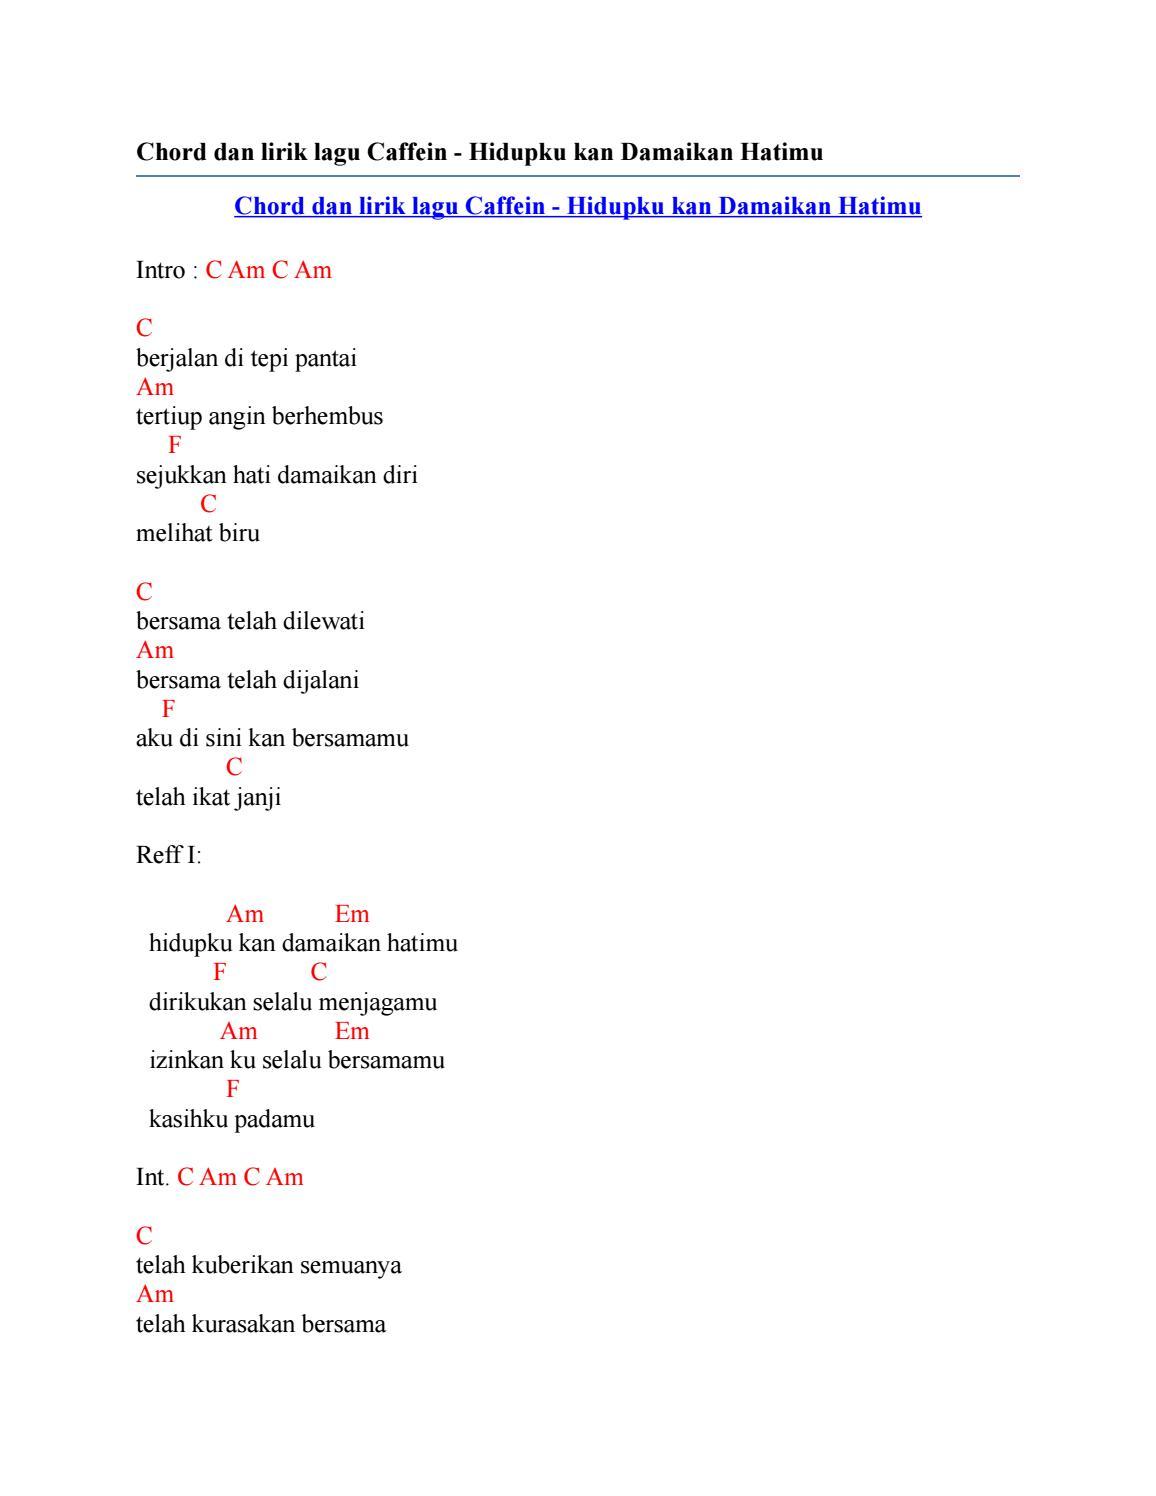 Download Lagu Caffeine Hidupku Kan Damaikan Hatimu : download, caffeine, hidupku, damaikan, hatimu, Chord, Lirik, Caffein, Hidupku, Damaikan, Hatimu, Issuu